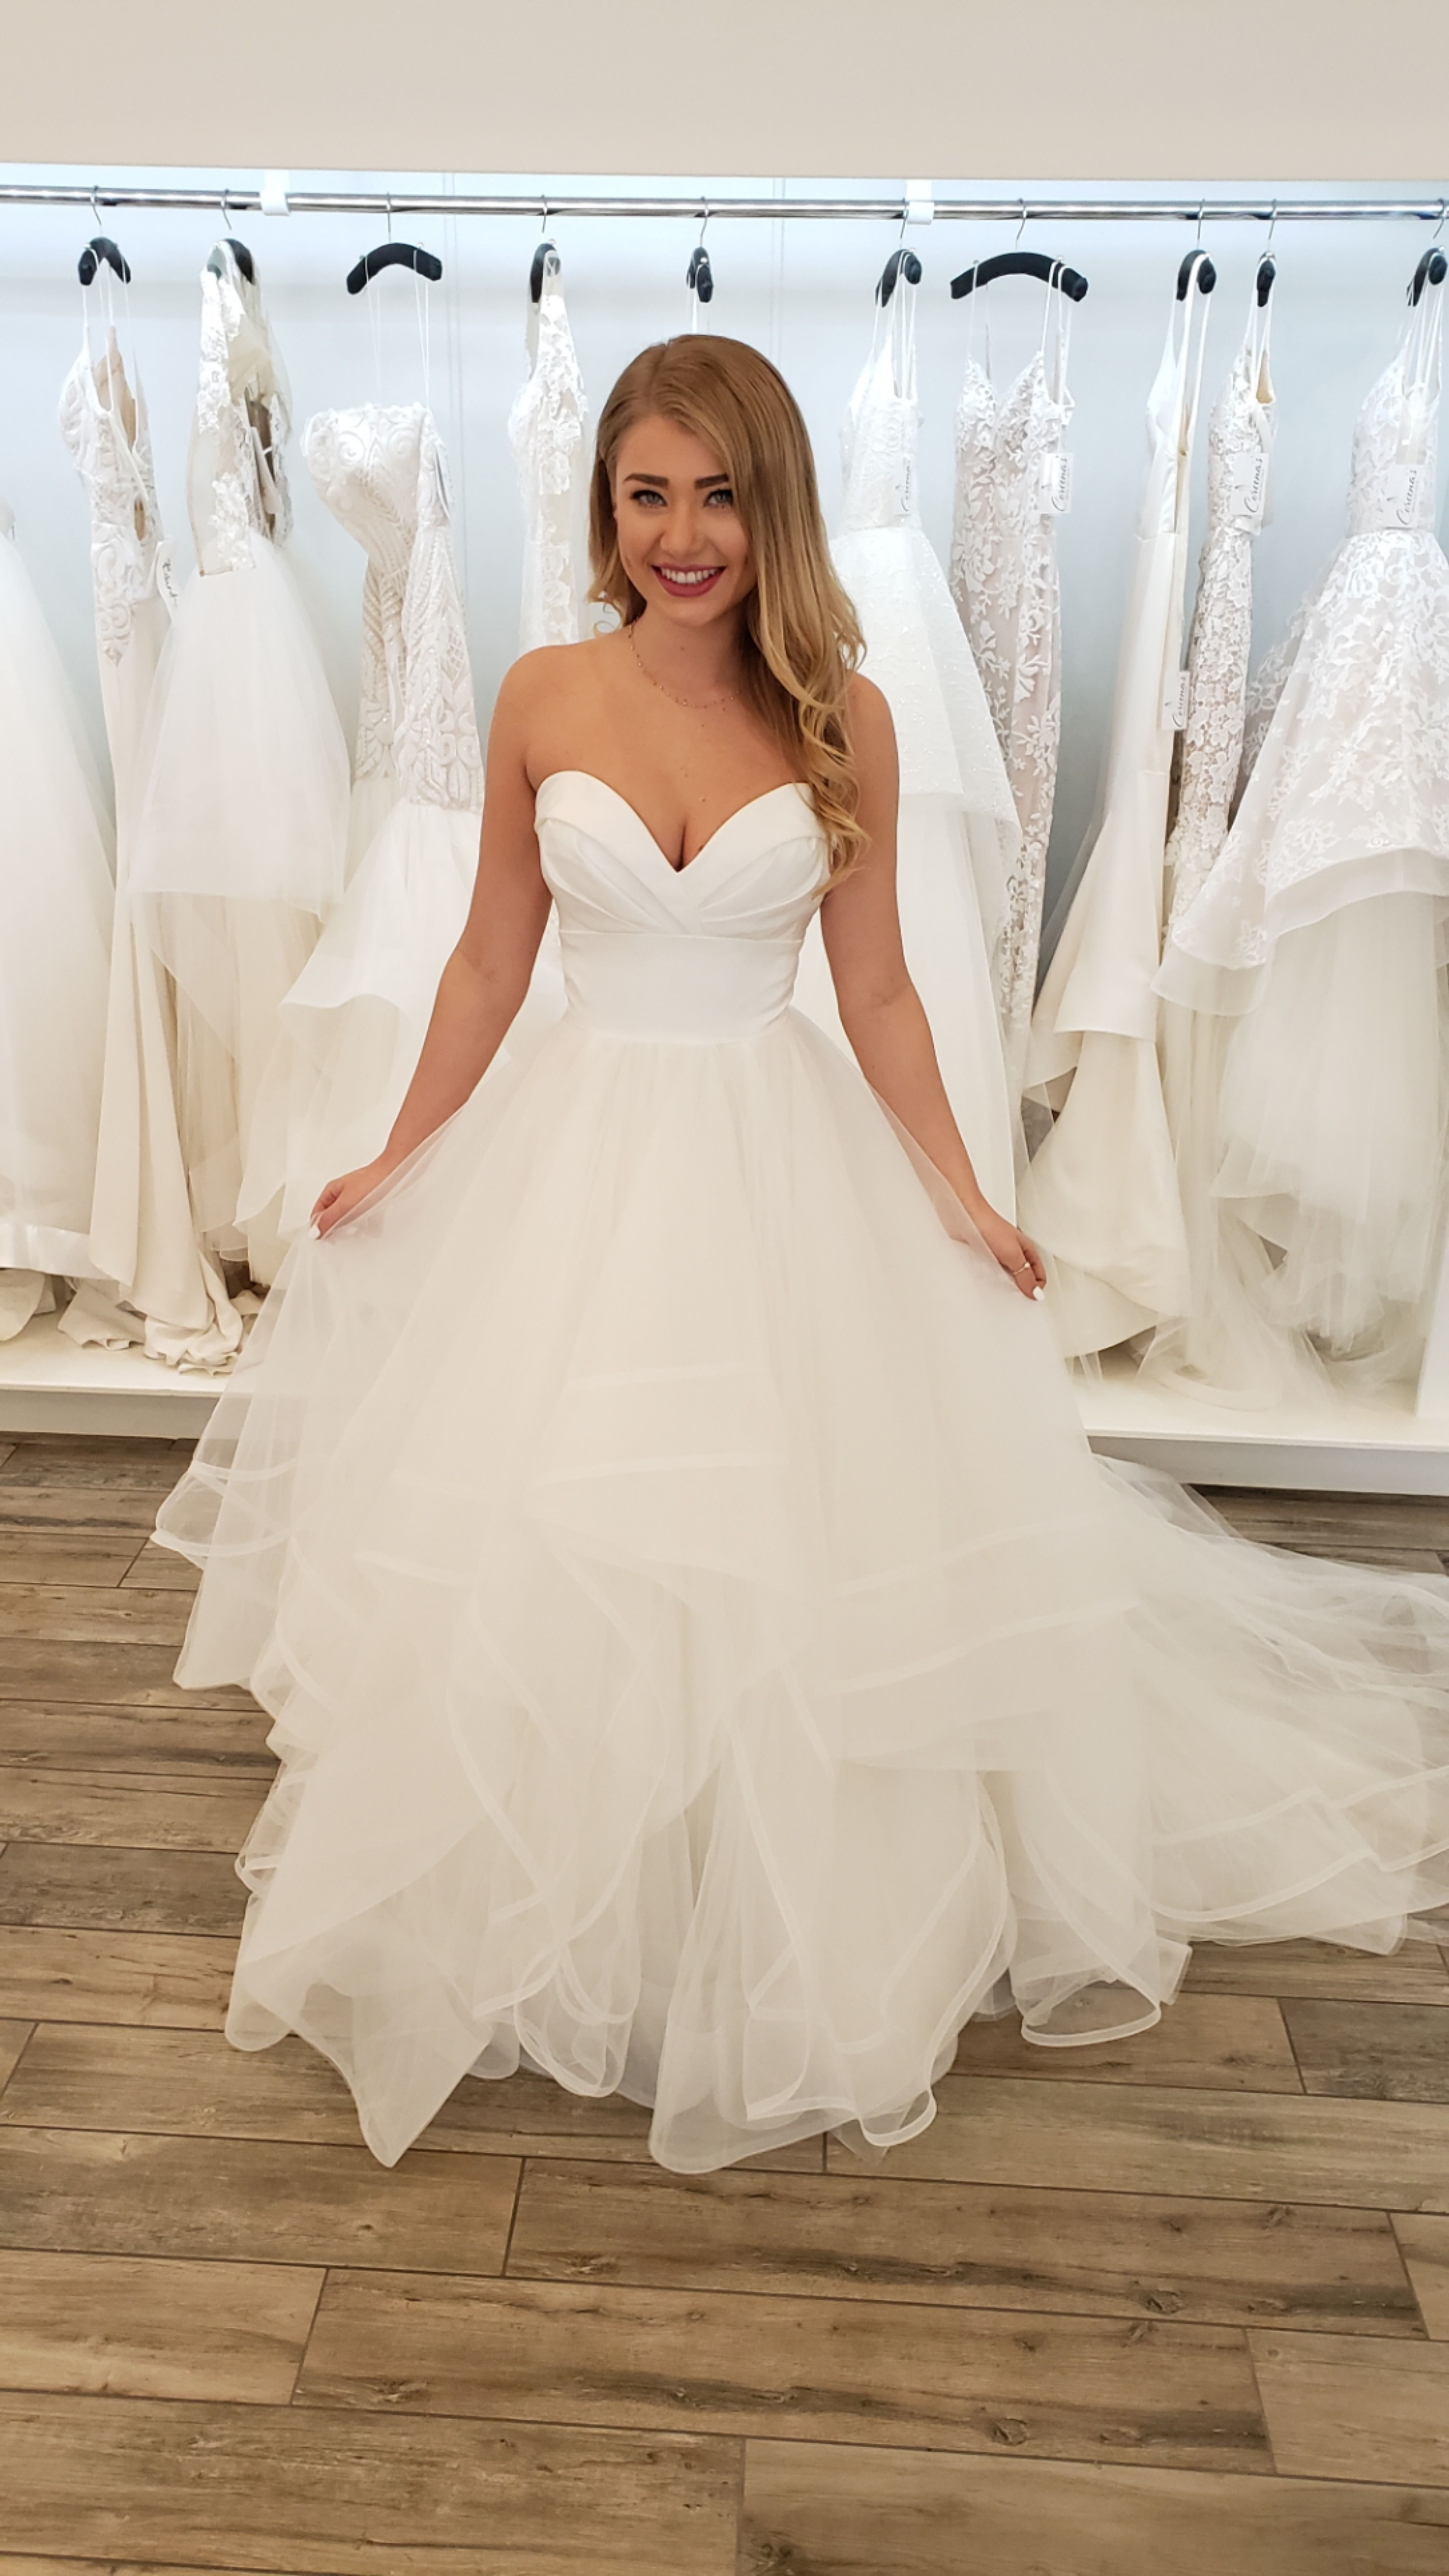 Loretta Princess Ball Gowns Strapless Wedding Dress Ballgown Ball Gown Wedding Dress [ 7168 x 4032 Pixel ]